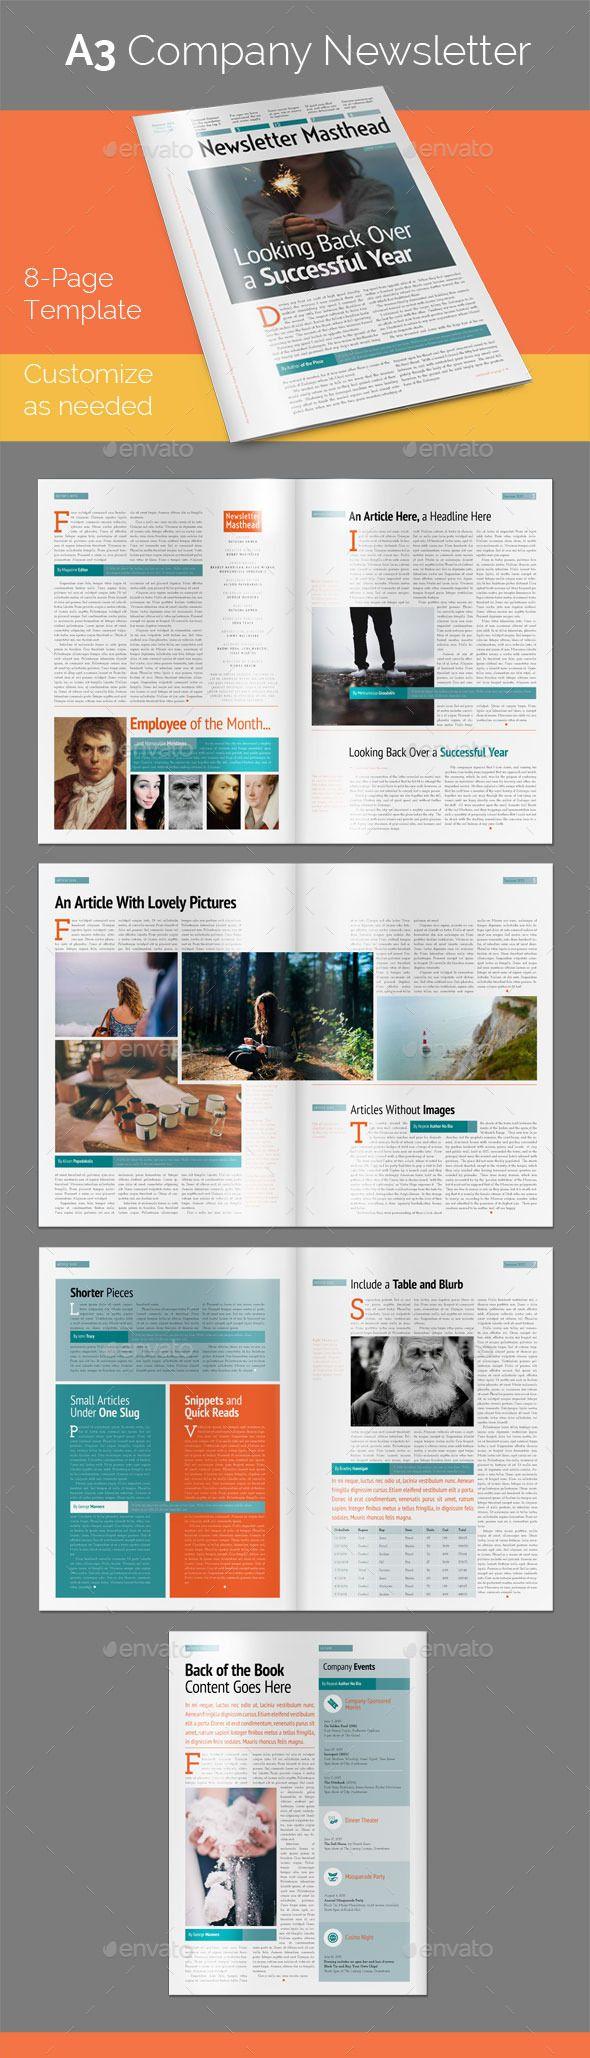 8 Page A3 Company Newsletter 43 best Newsprint